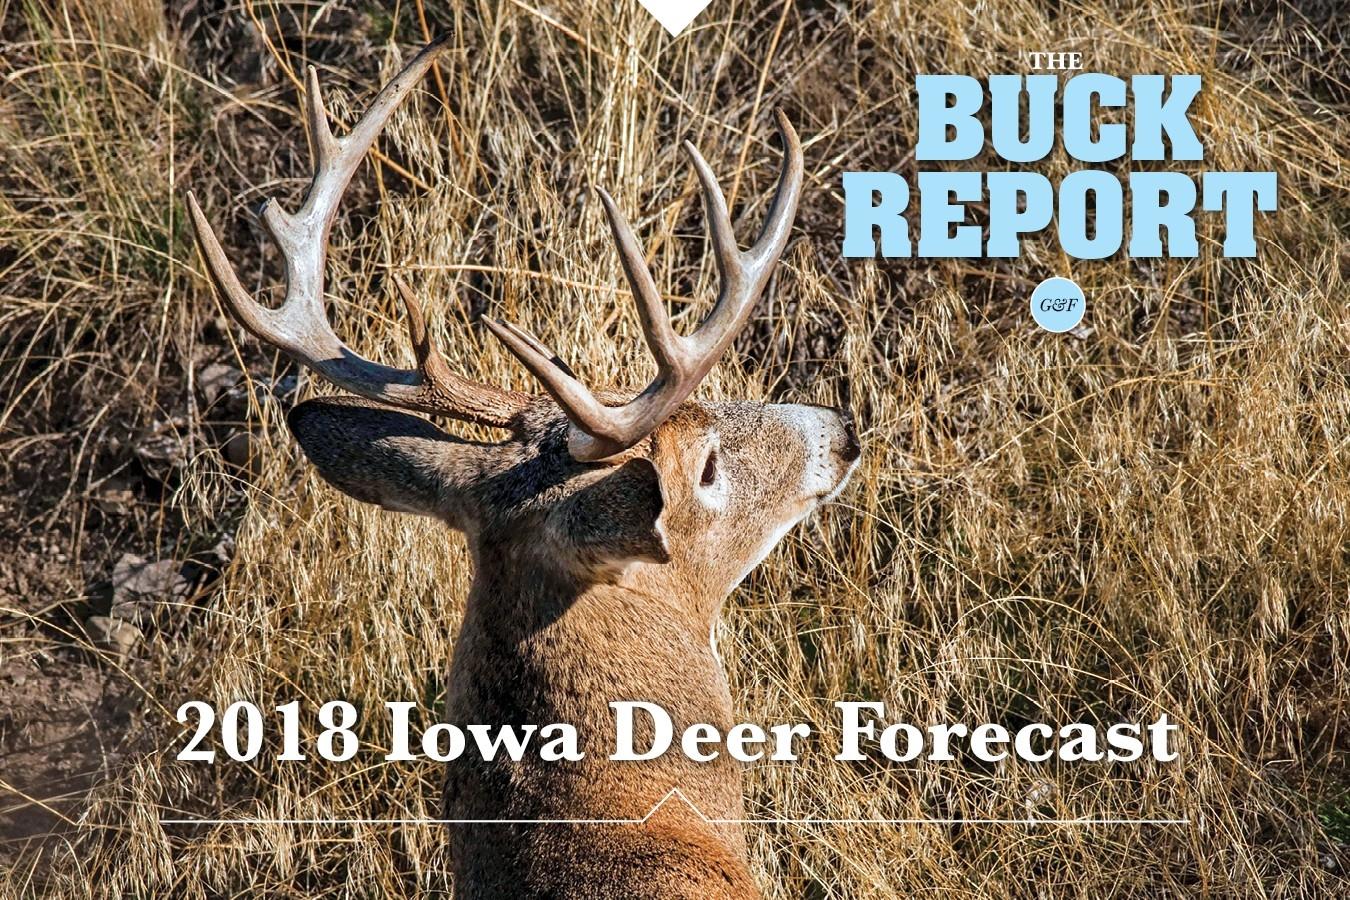 Iowa  Indiana Deer Forcast